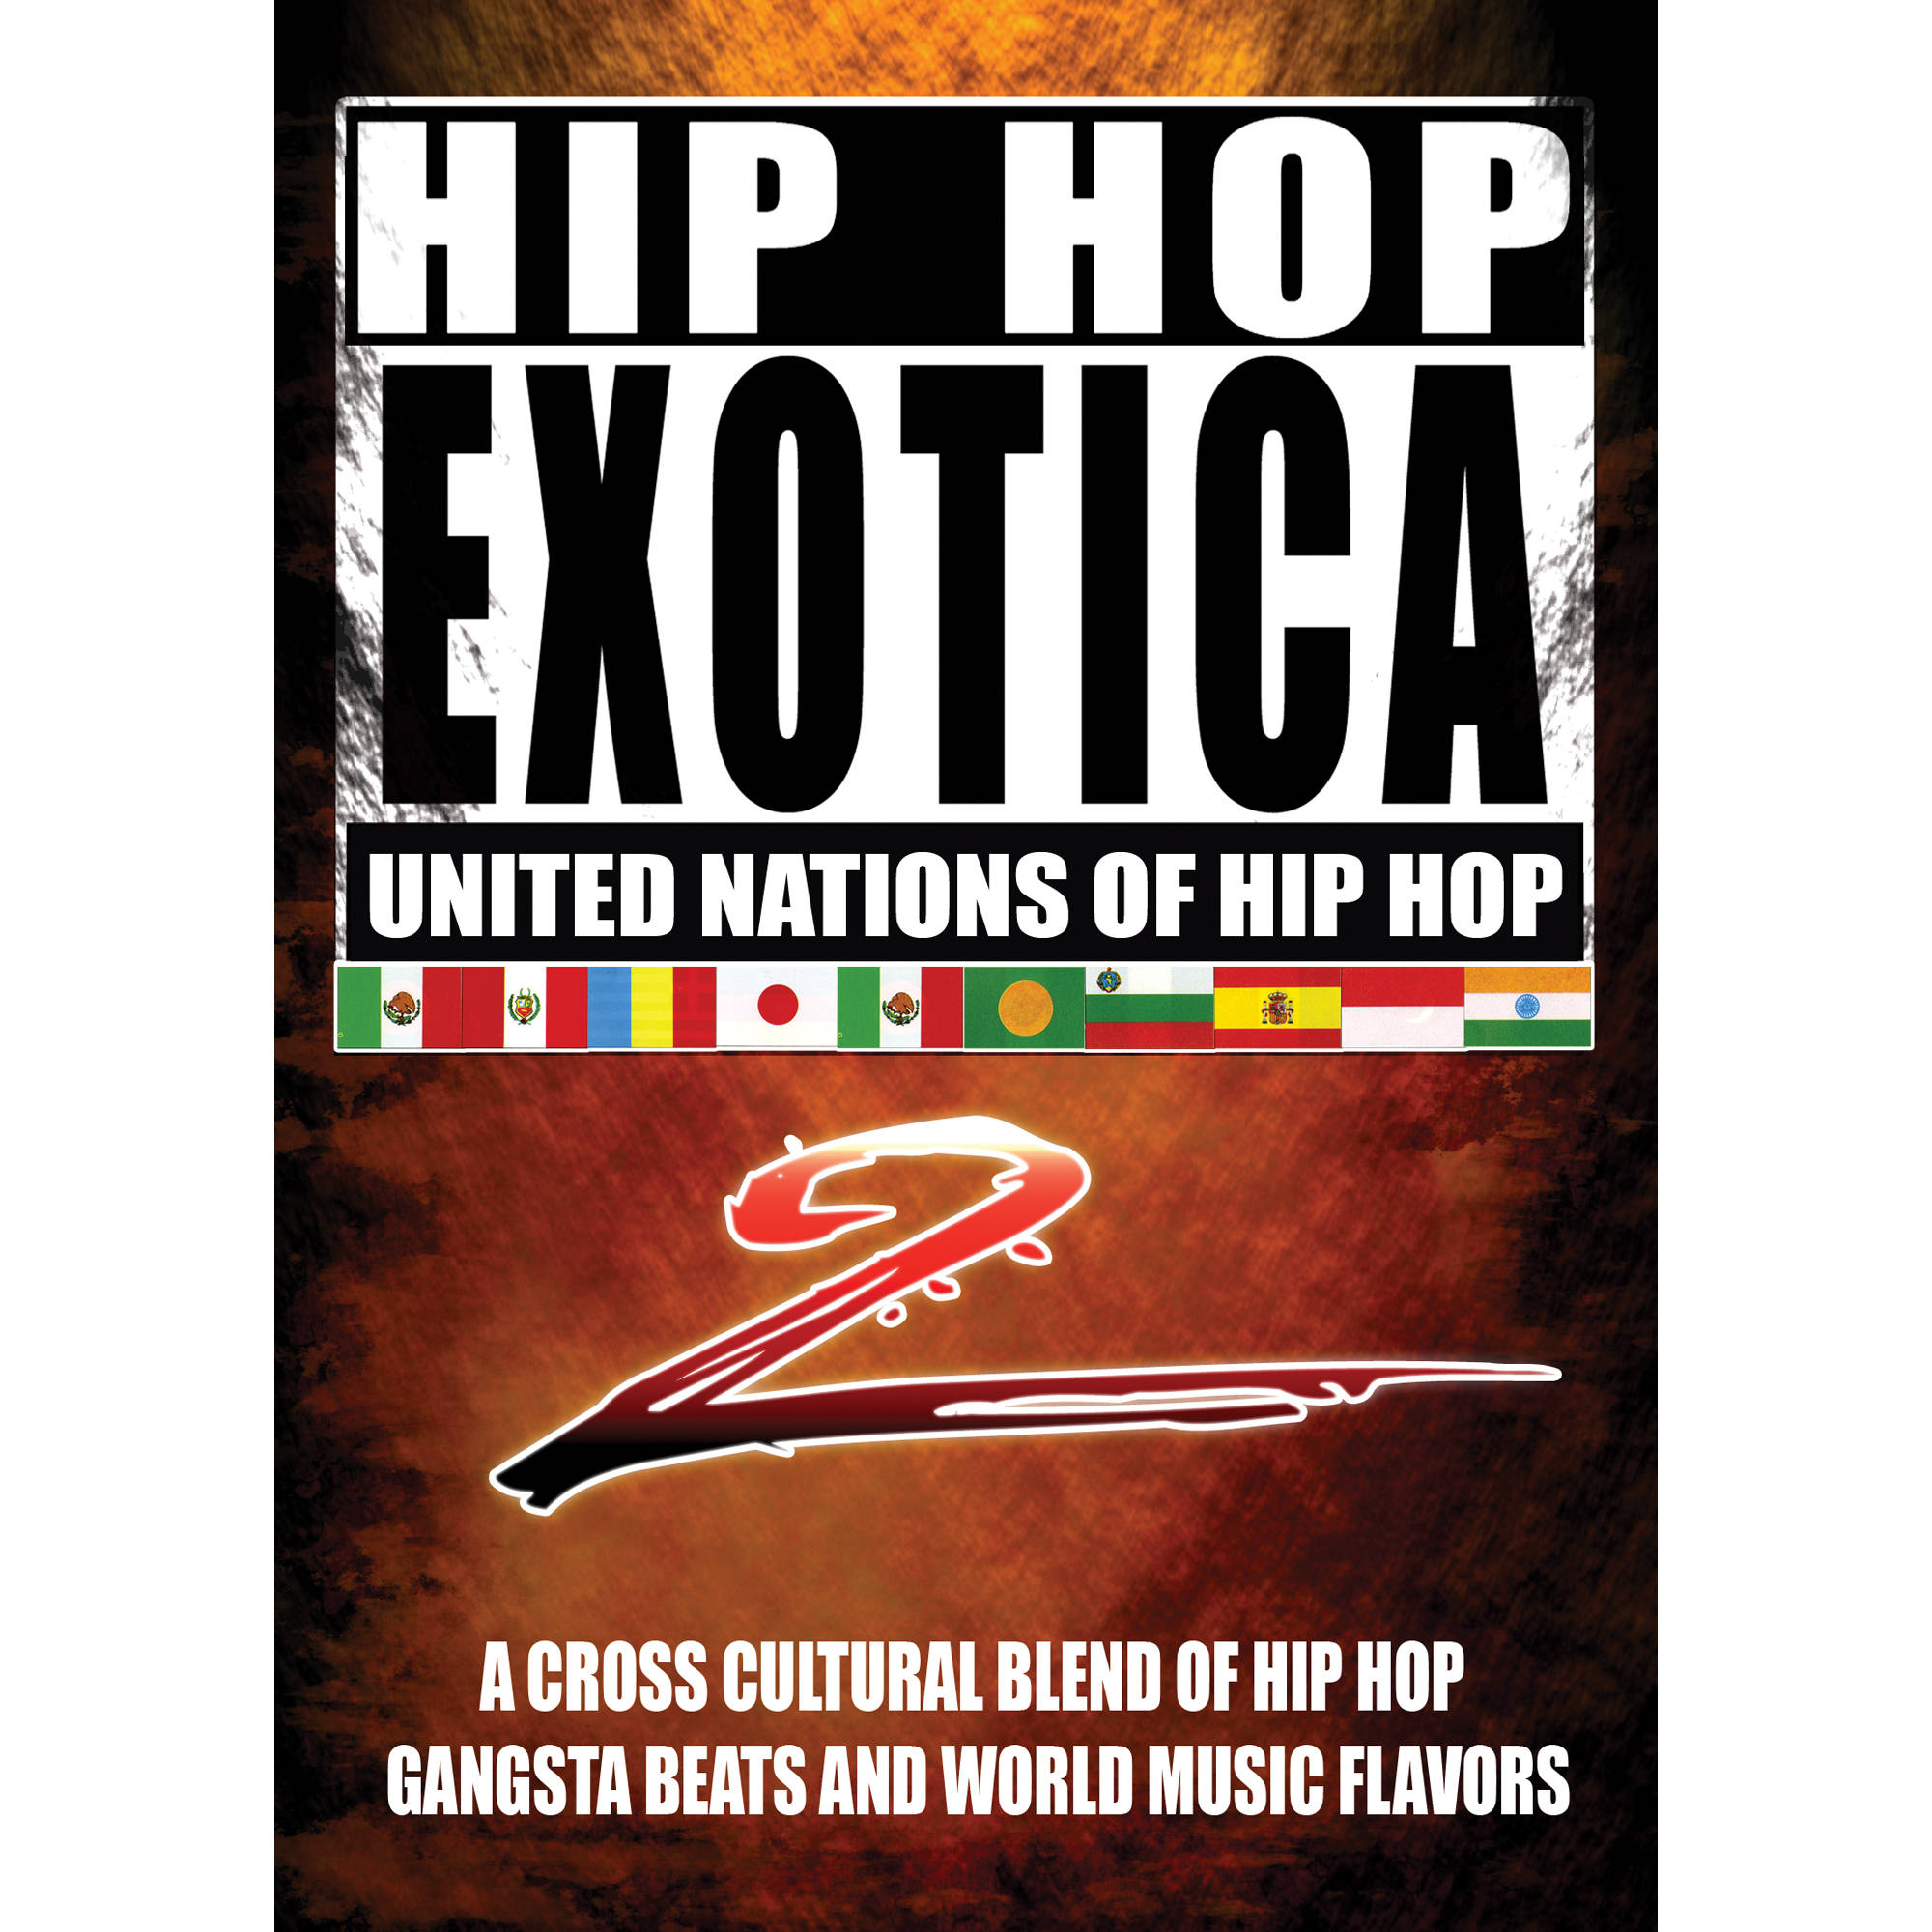 Big fish audio hip hop exotica 2 dvd hhex2 orwxz b h photo for Big fish audio